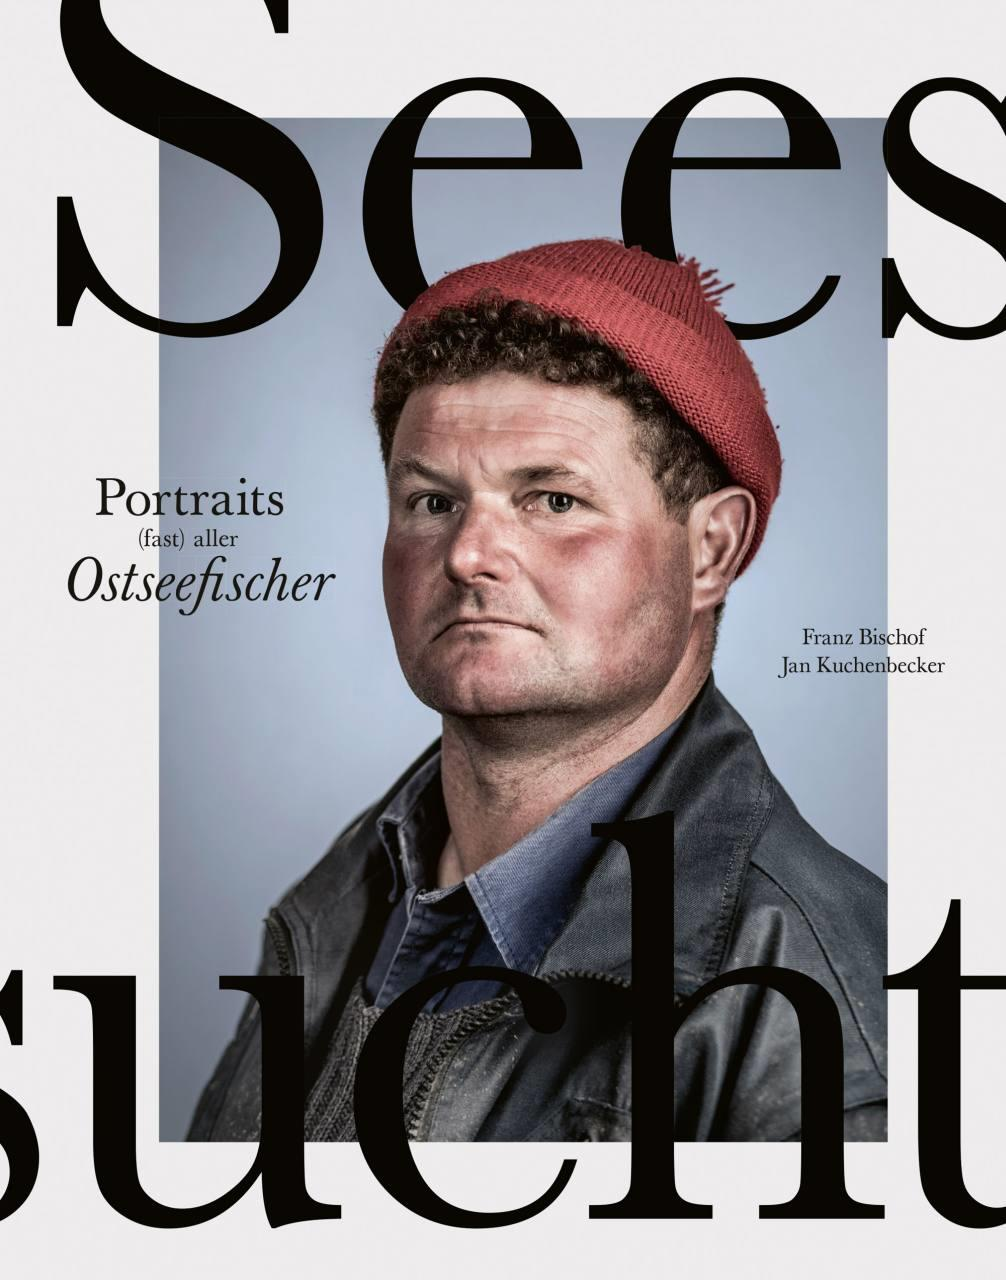 Seesucht - Portraits (fast) aller Ostseefischer